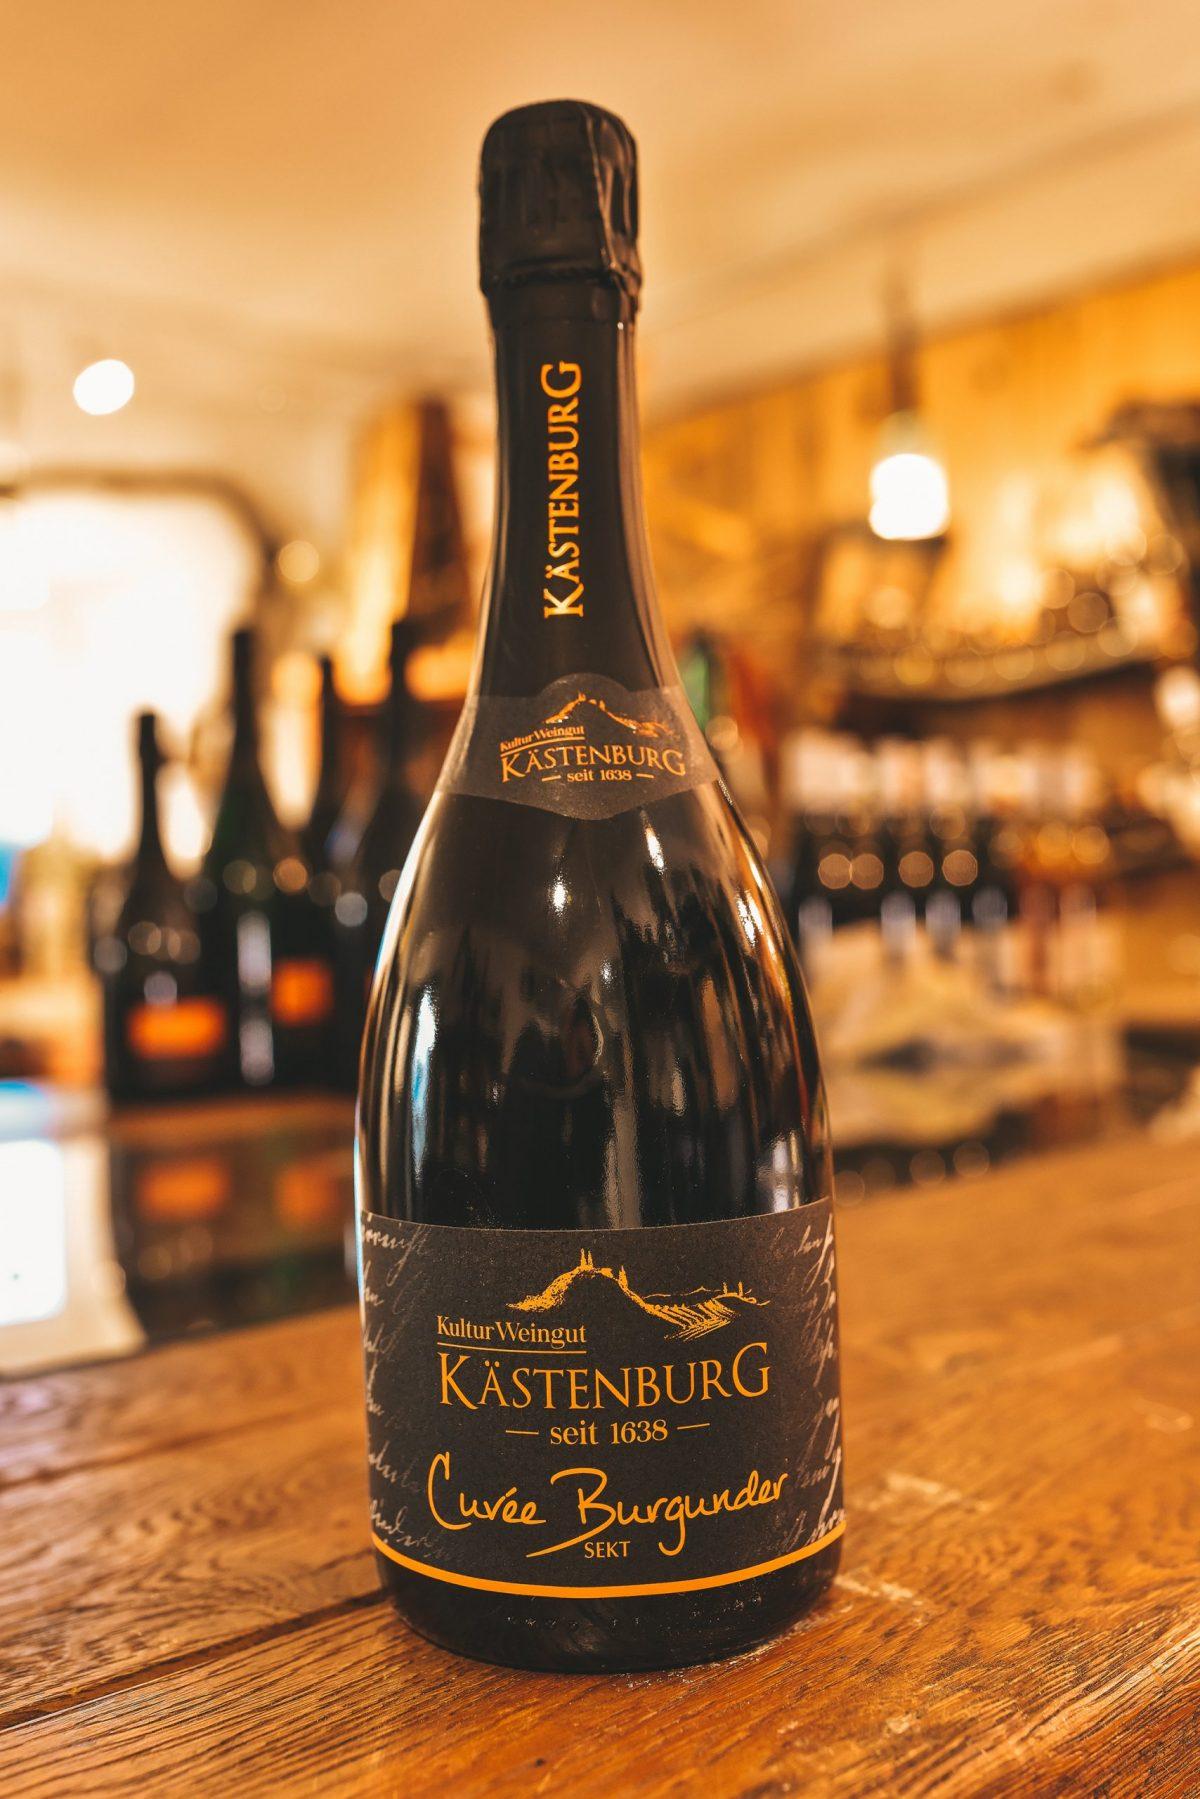 Cuvee Burgunder Sekt scaled | Kästenburg